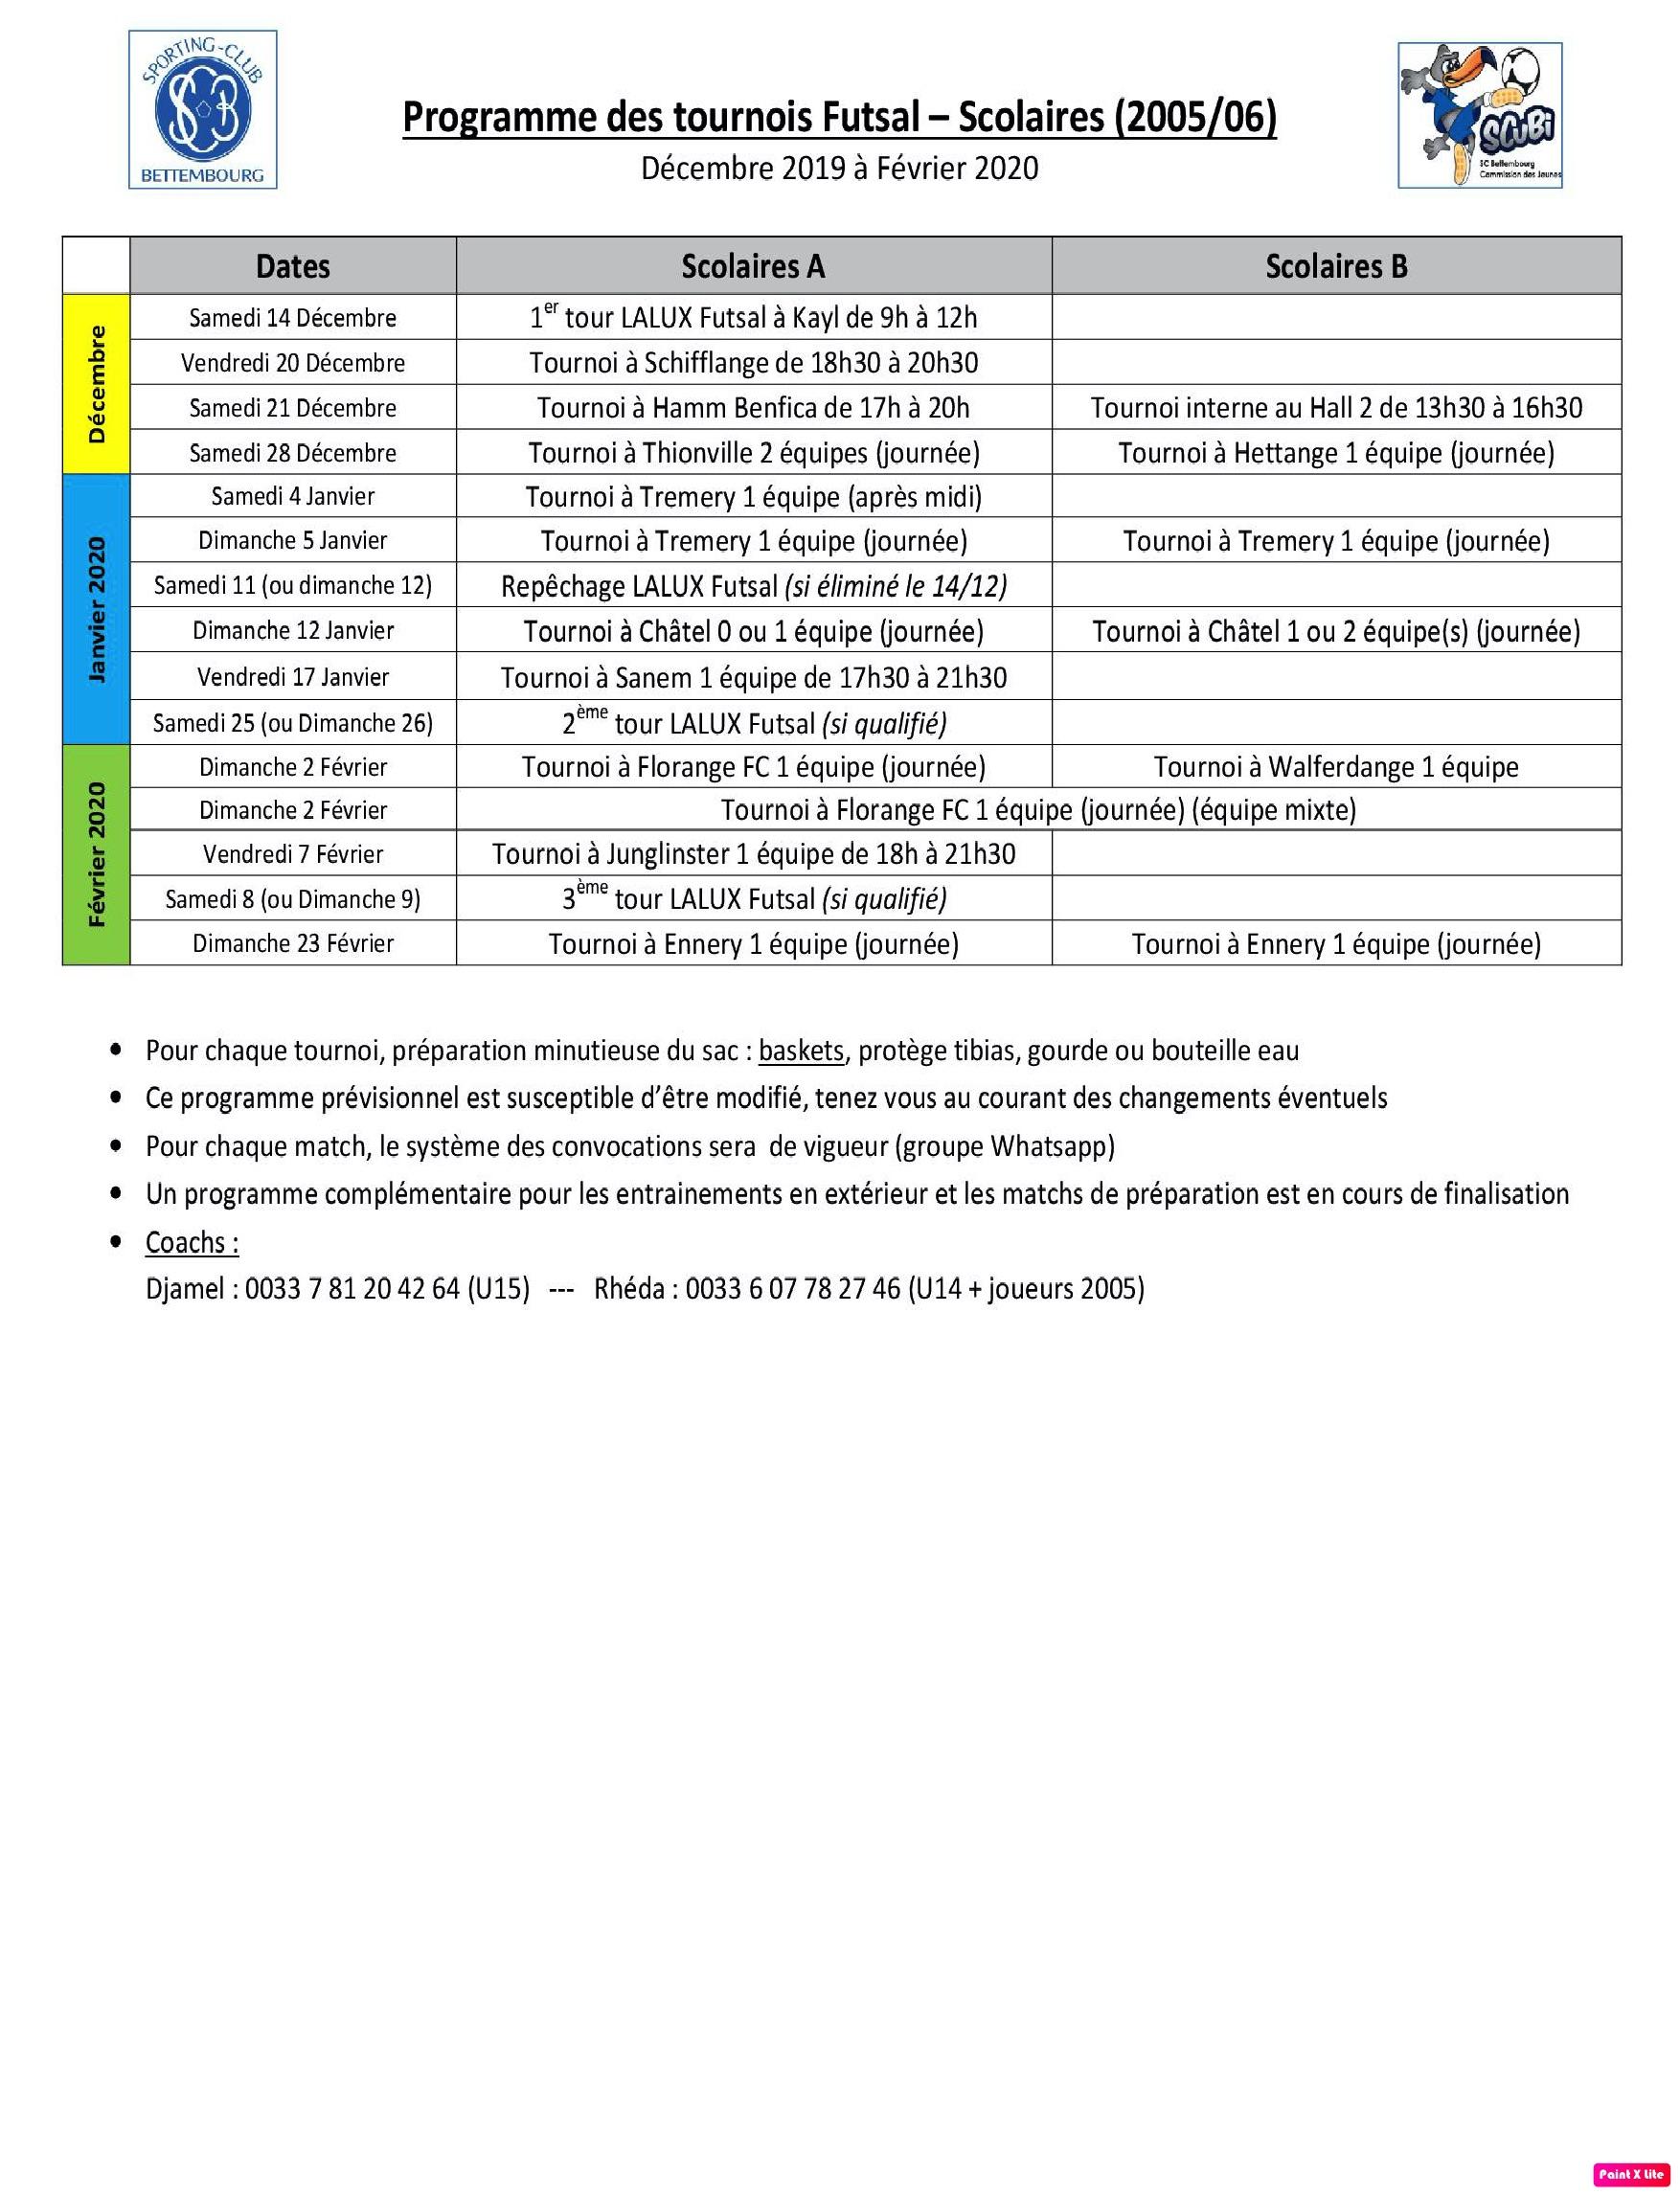 Programmes des tournois Futsal - Scolaires (2019-2020)